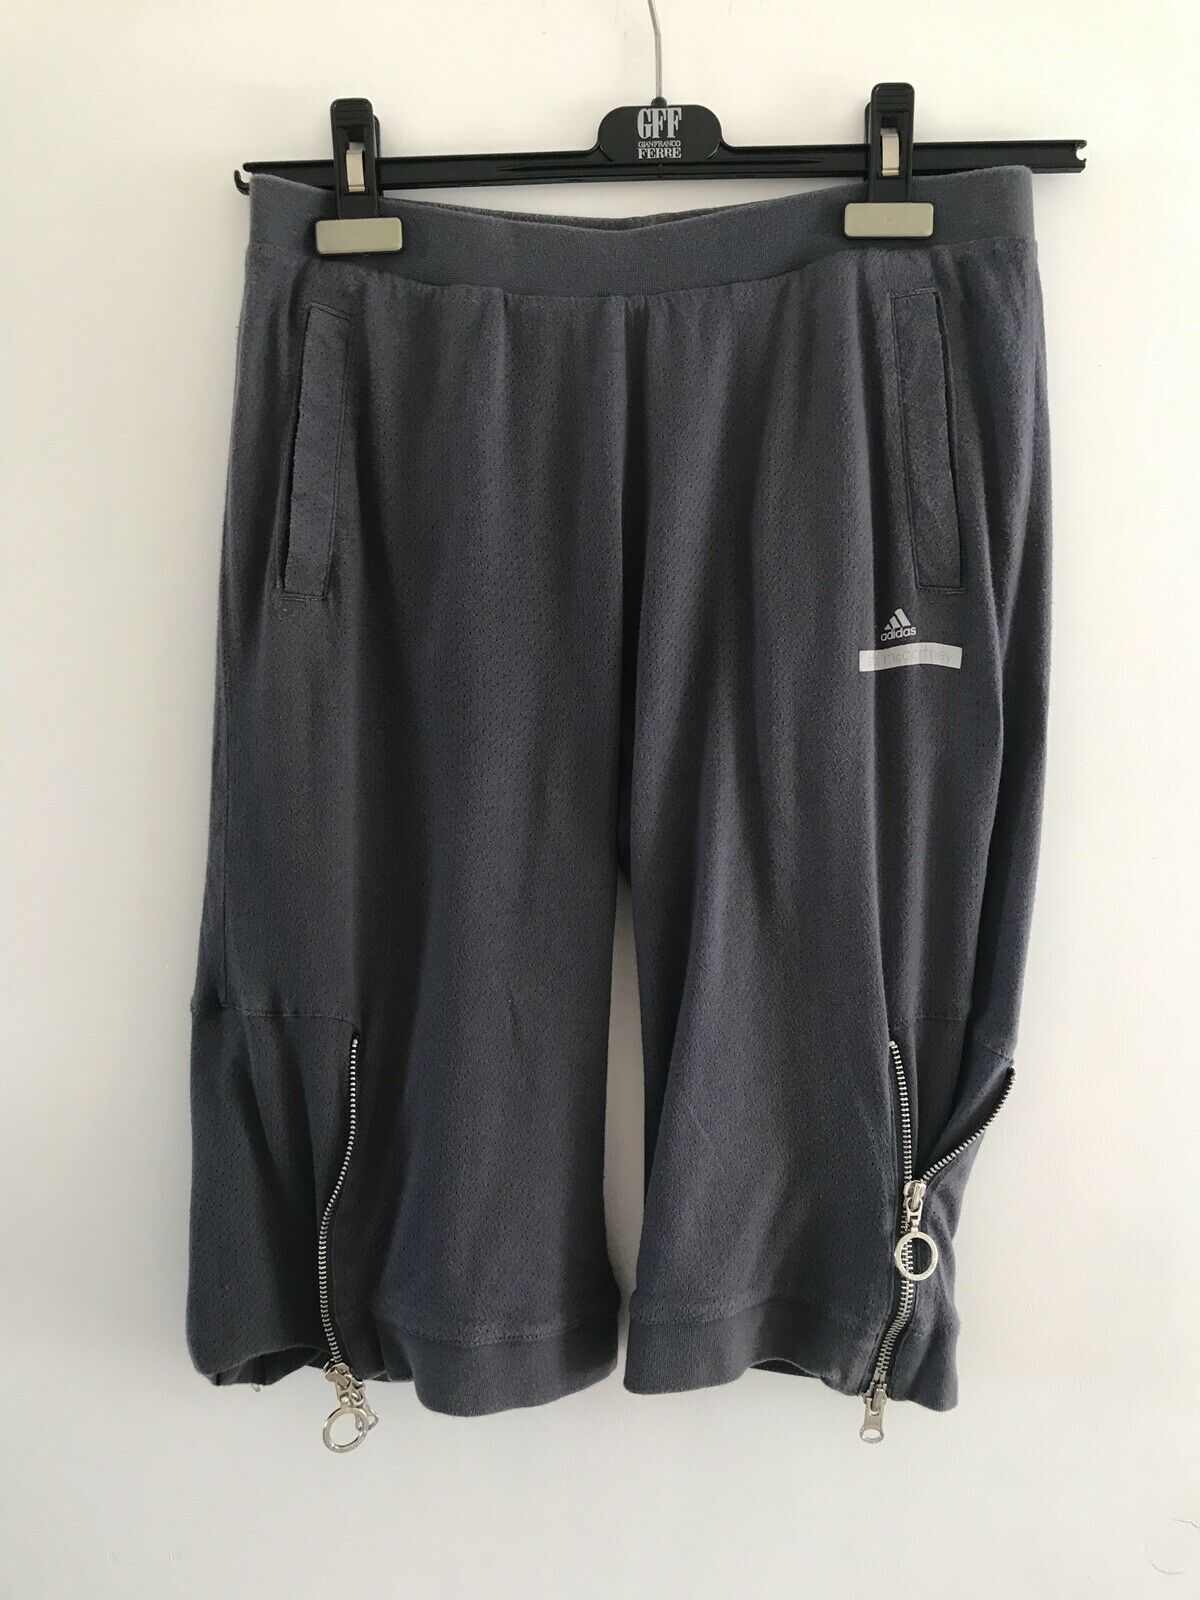 Rare Stella McCartney Zipper Side Knee Shorts Net A Porter